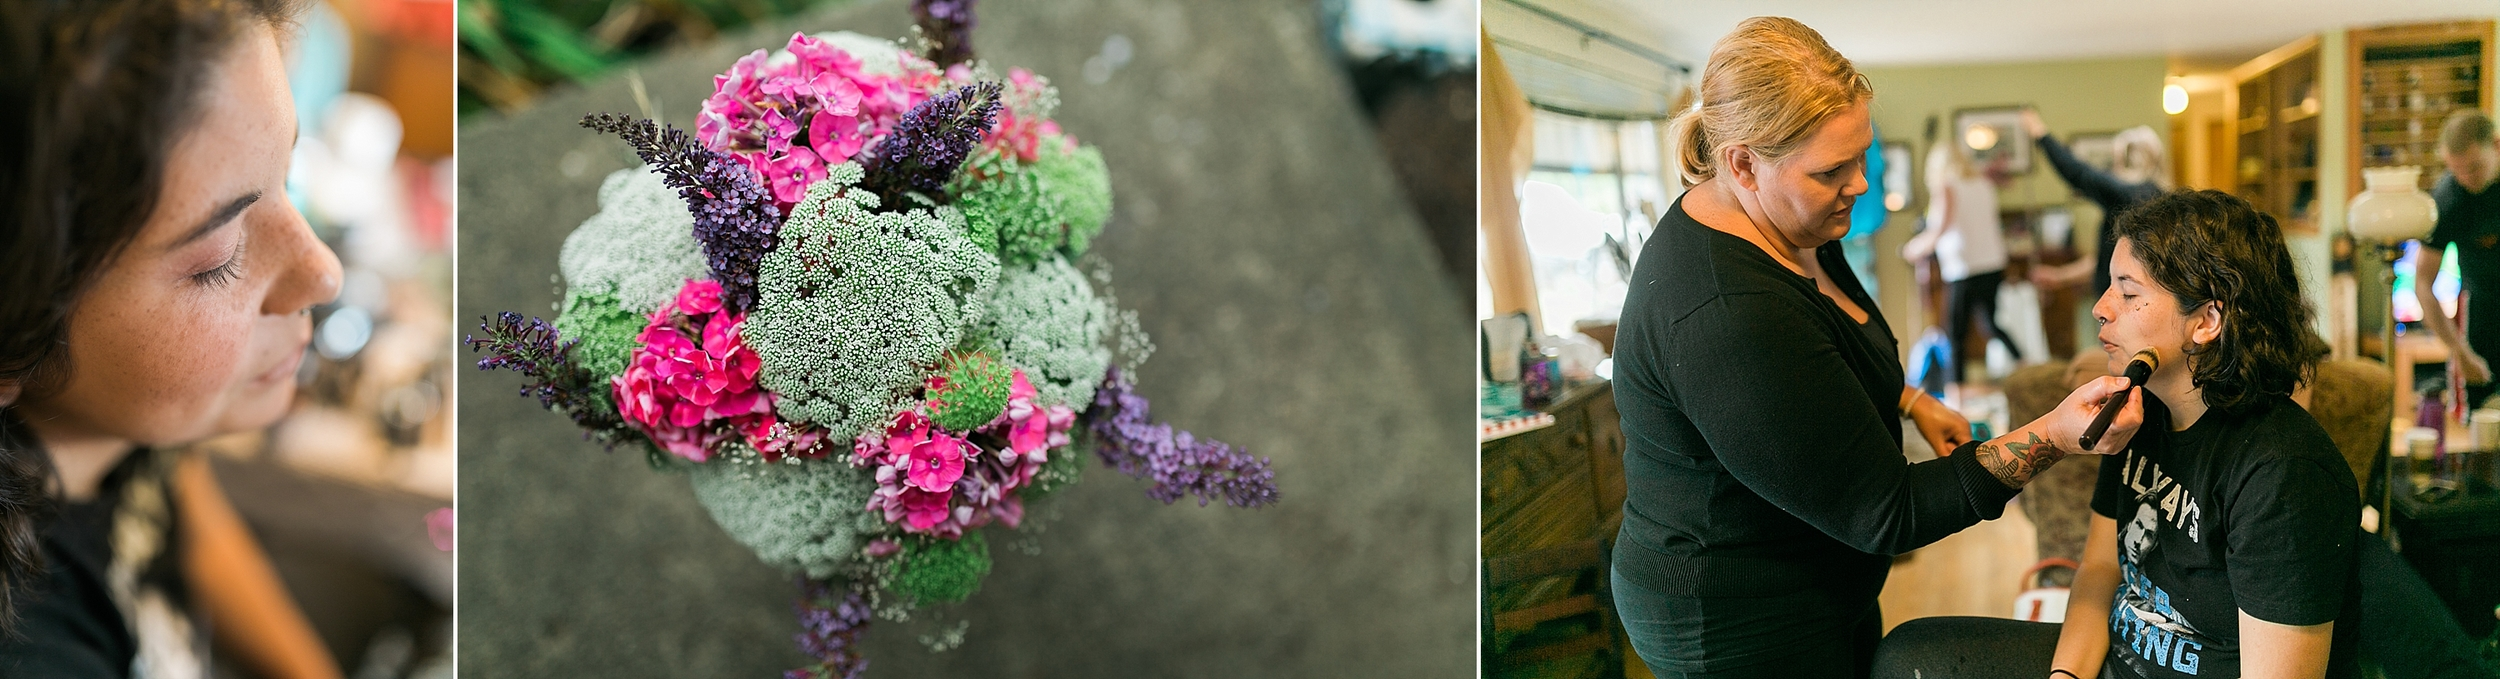 ashley vos photography seattle area wedding photographer_0610.jpg